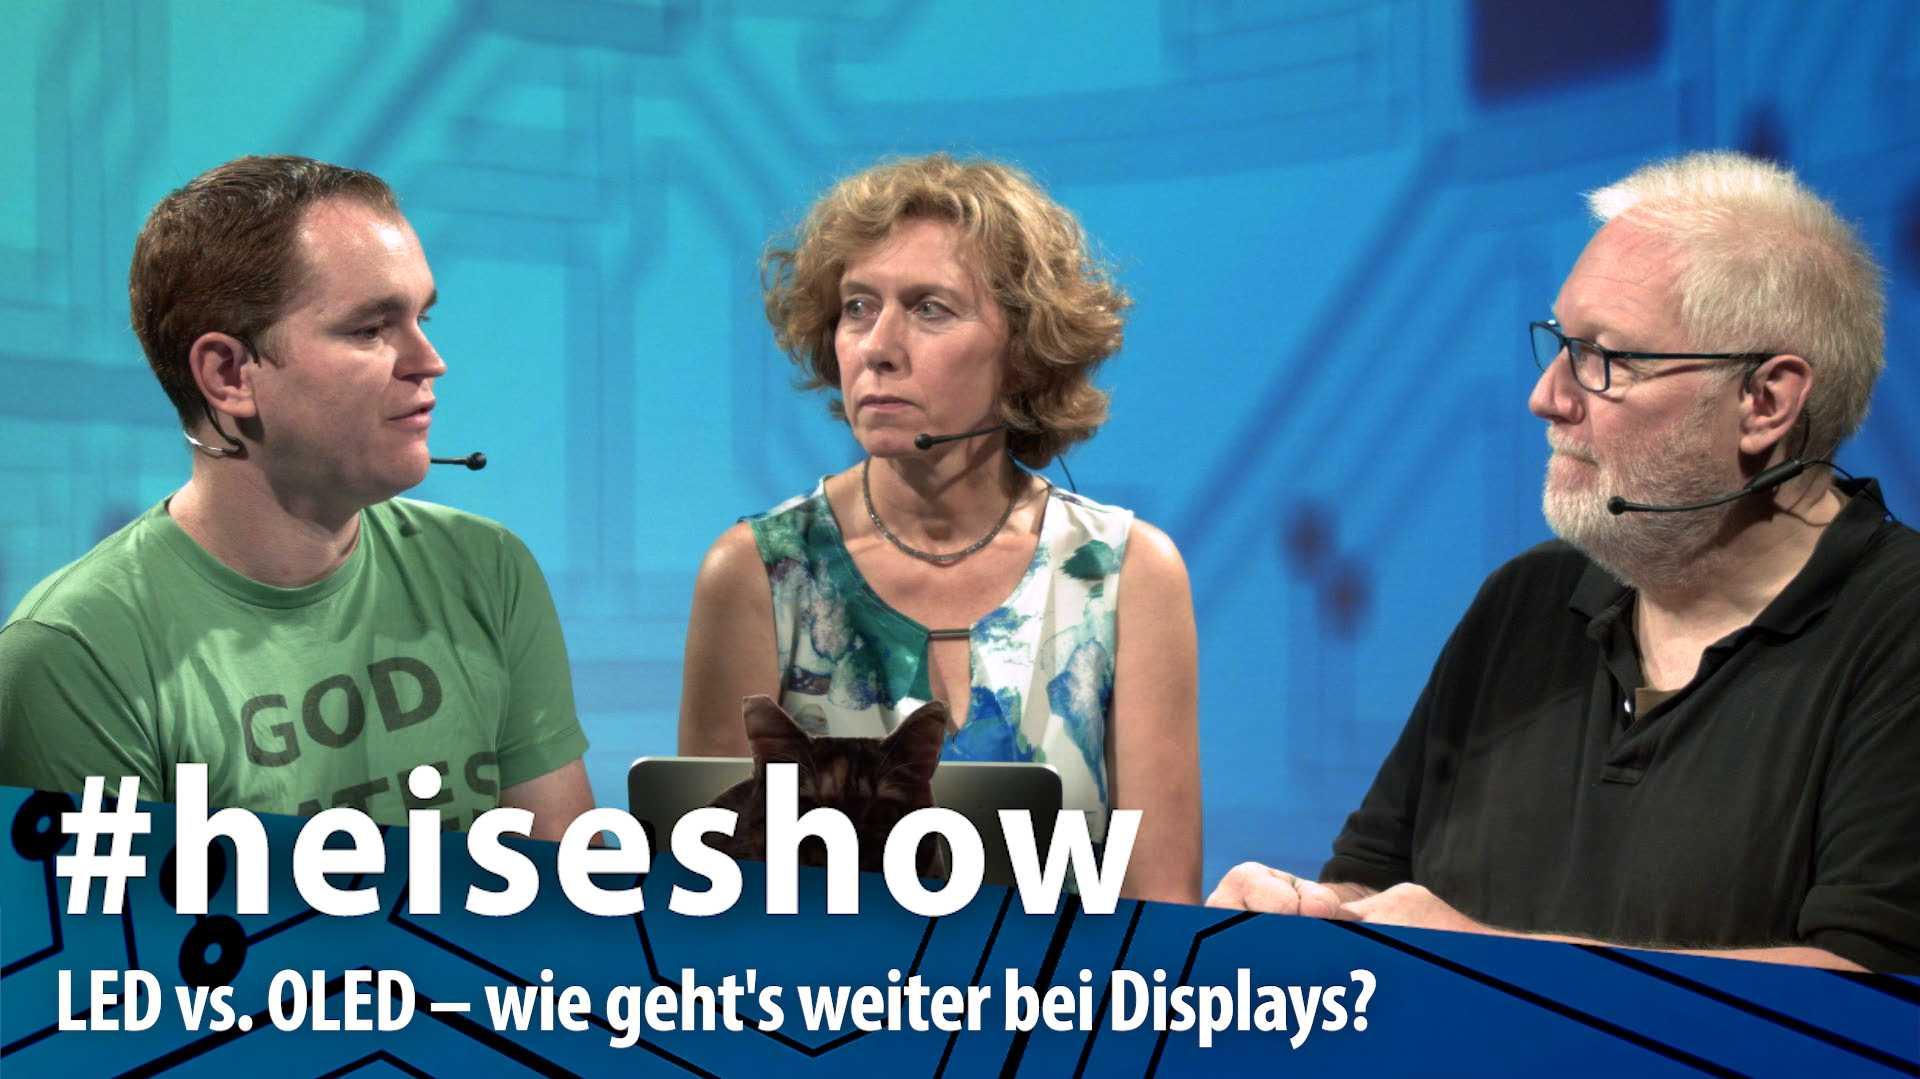 #heiseshow, live ab 12 Uhr: LED vs. OLED – wie geht's weiter bei Displays?